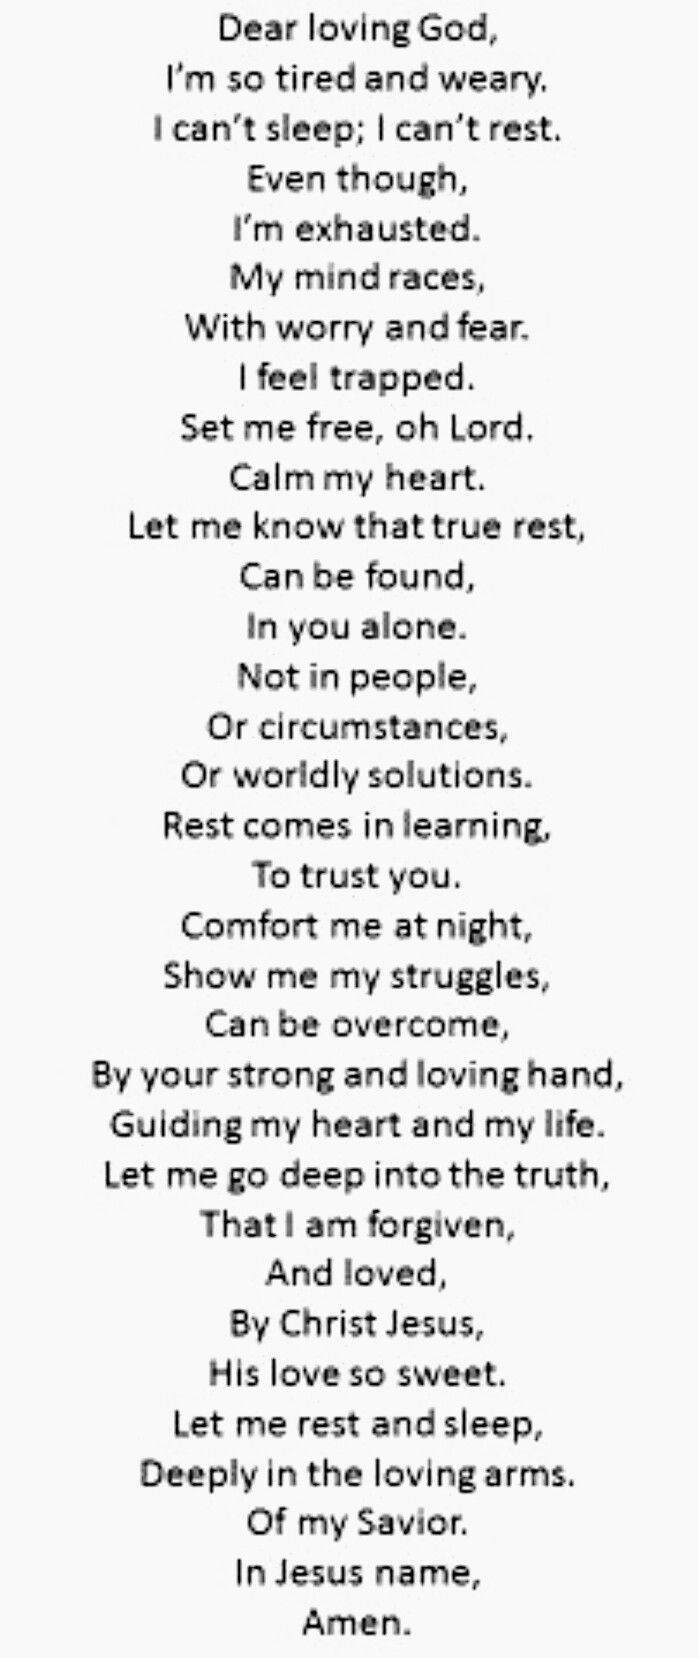 Prayer for rest and sleep